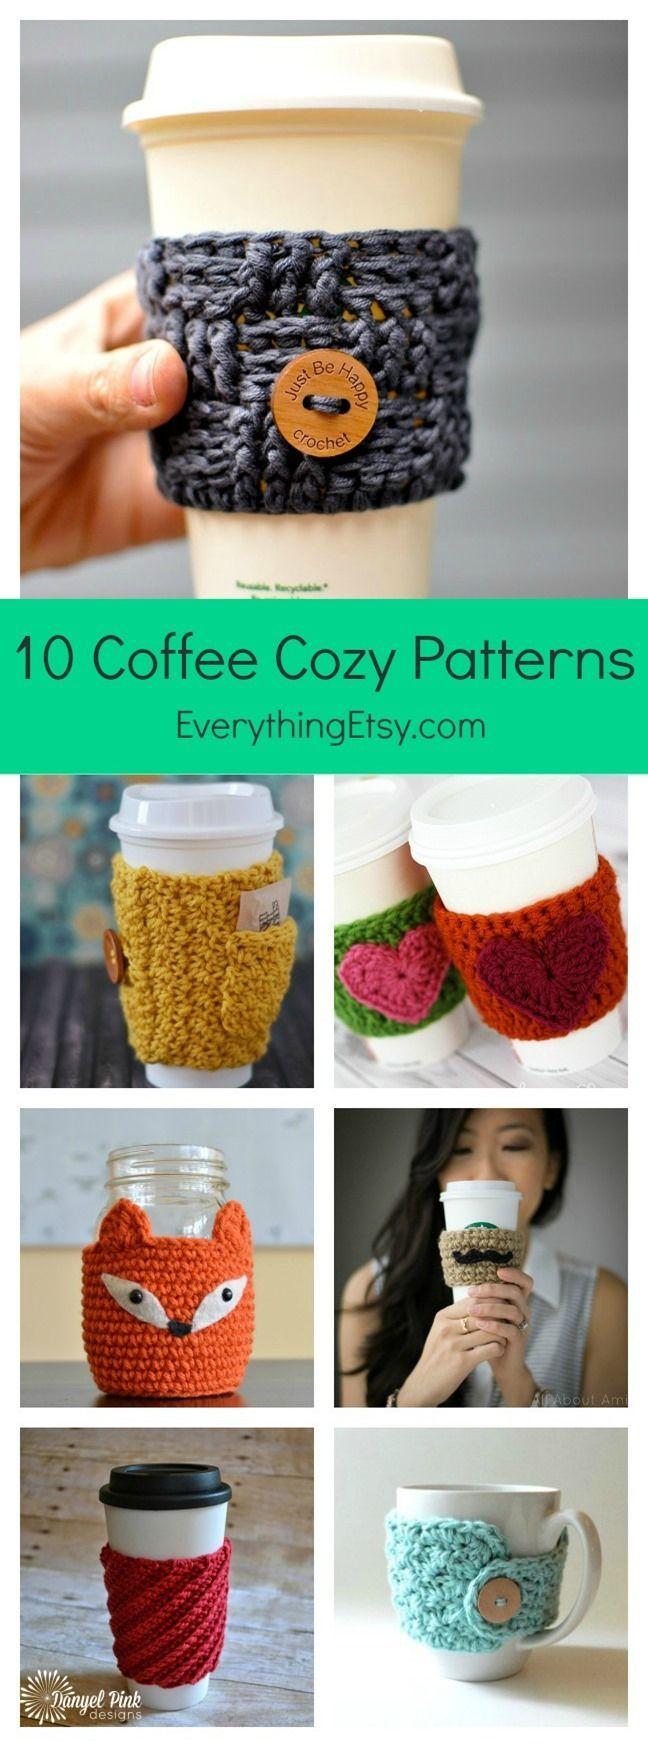 16 best Coffee cozy loom knit images on Pinterest | Mug, Bricolage ...